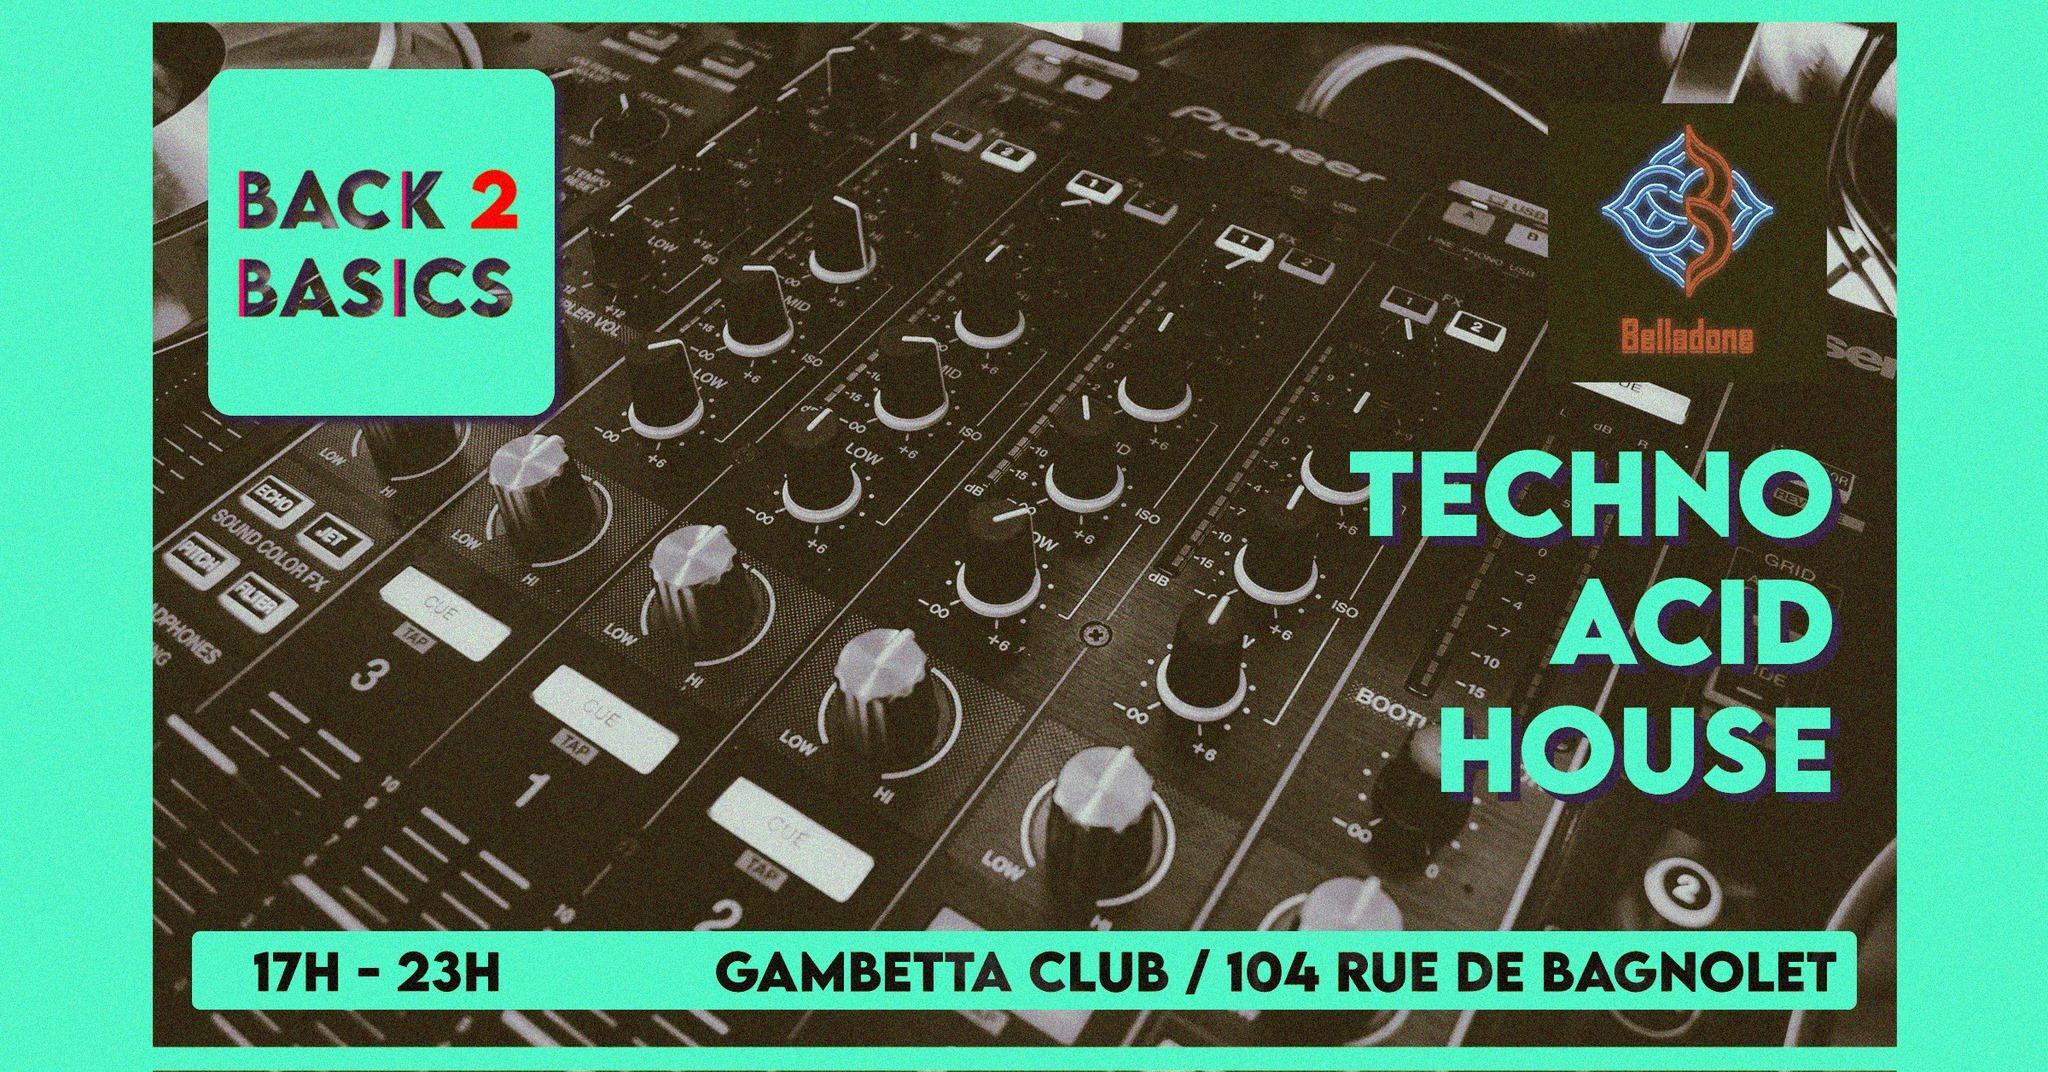 JEUDI 24/06 - Back To Basics - Techno/Acid/House